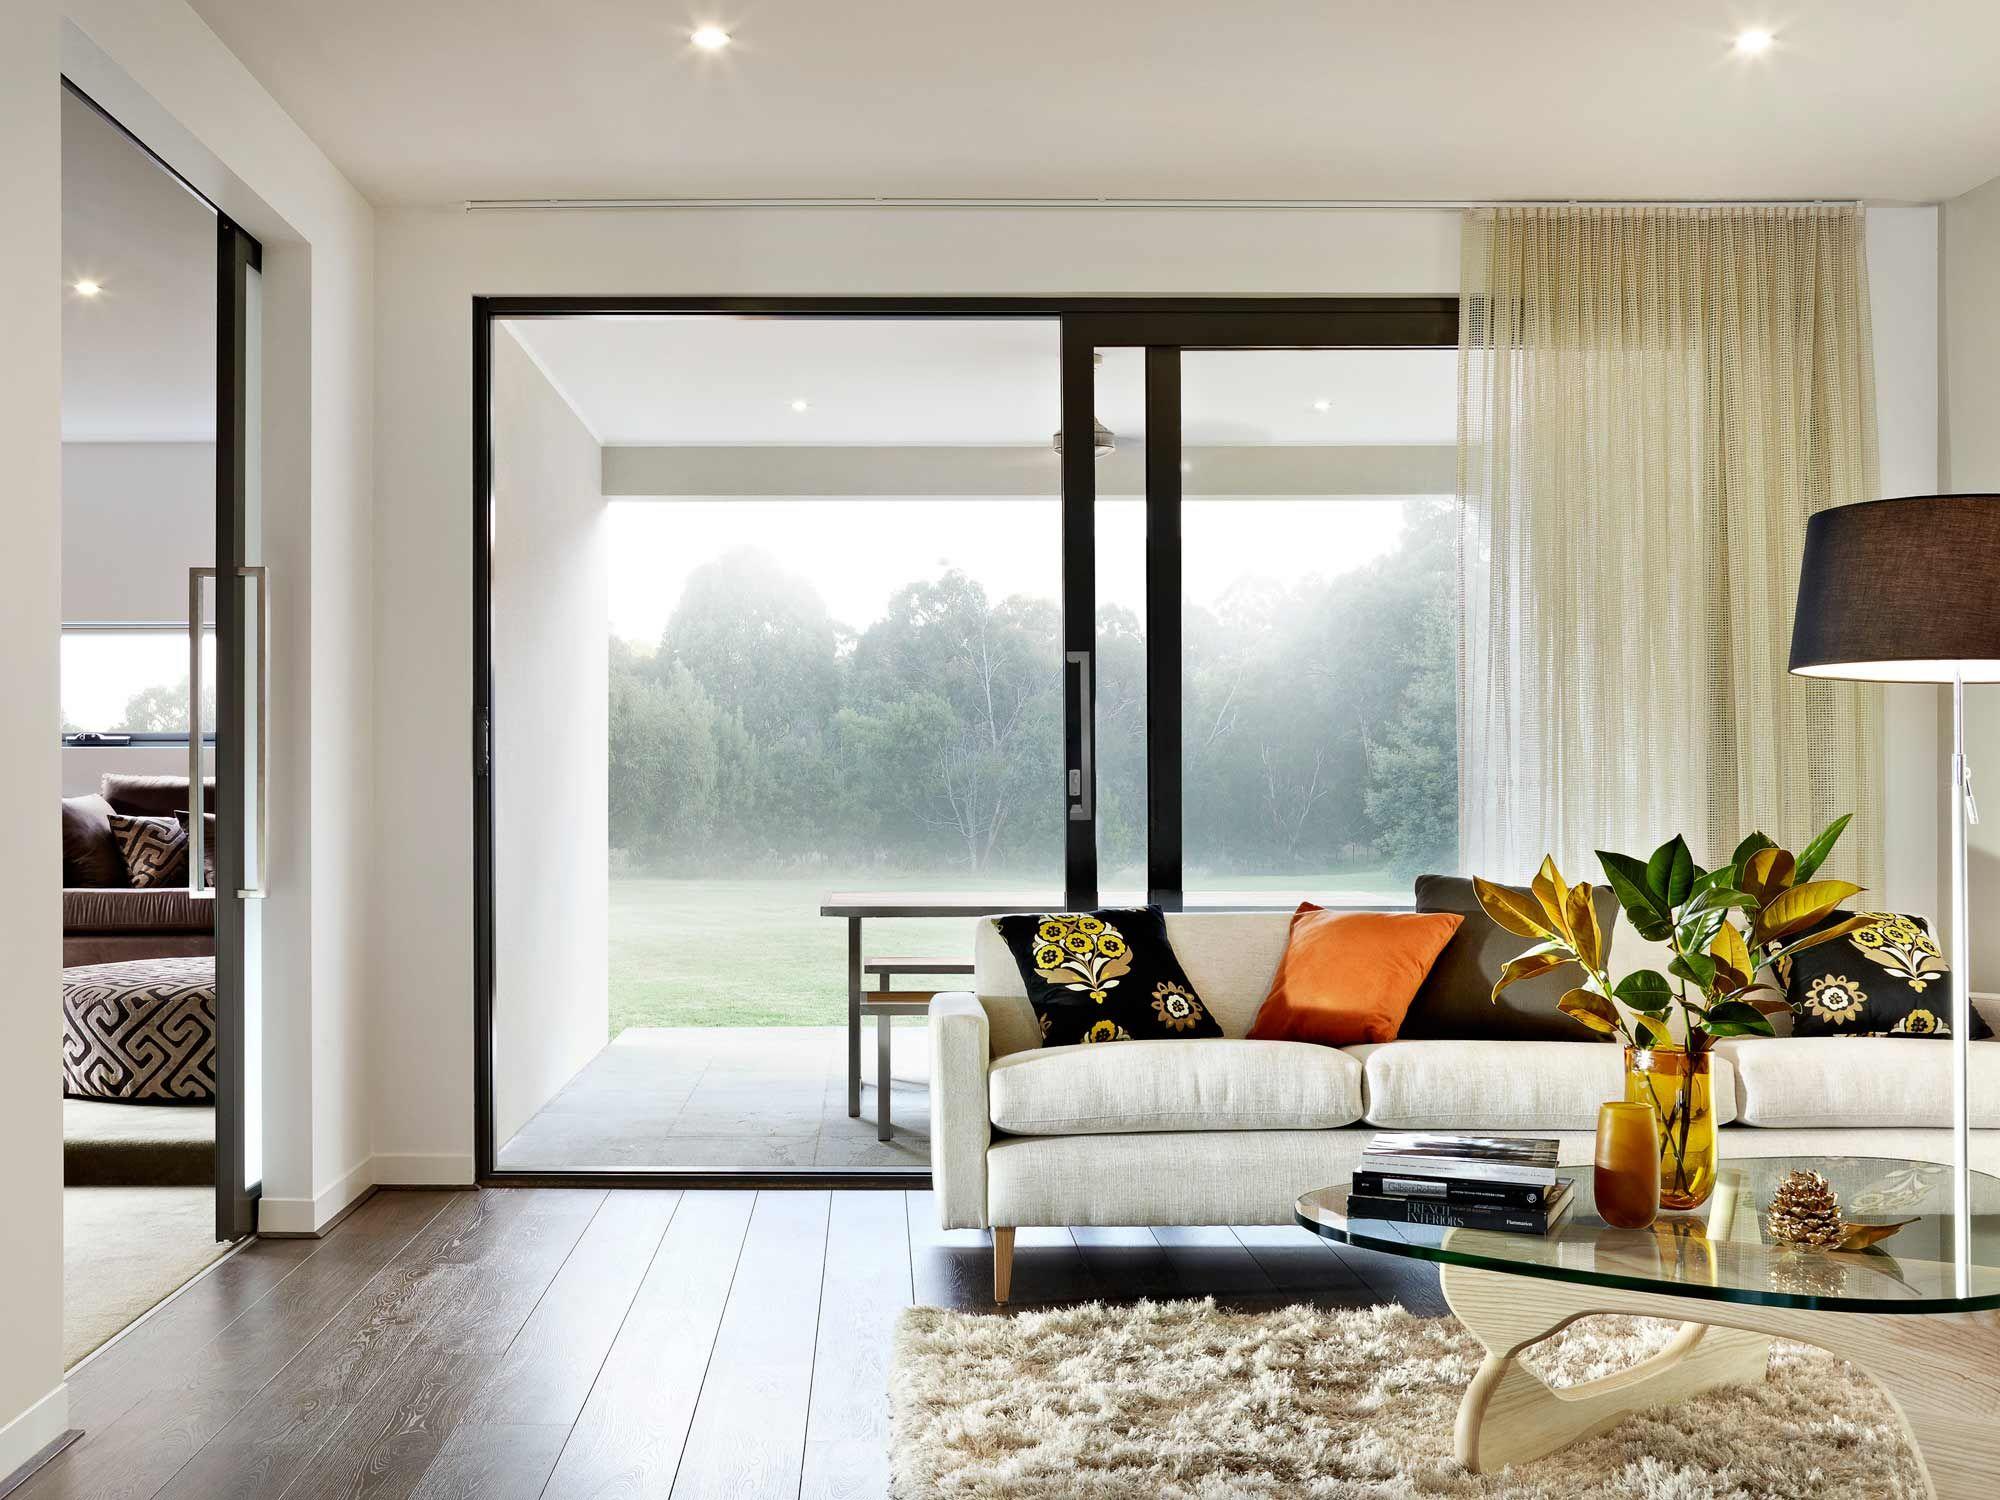 Aluminium Windows Aluminium Doors Bifold Bi Fold Doors Sliding Doors Fly Screen W Living Room Sets Living Room Layout Planner Best Home Interior Design